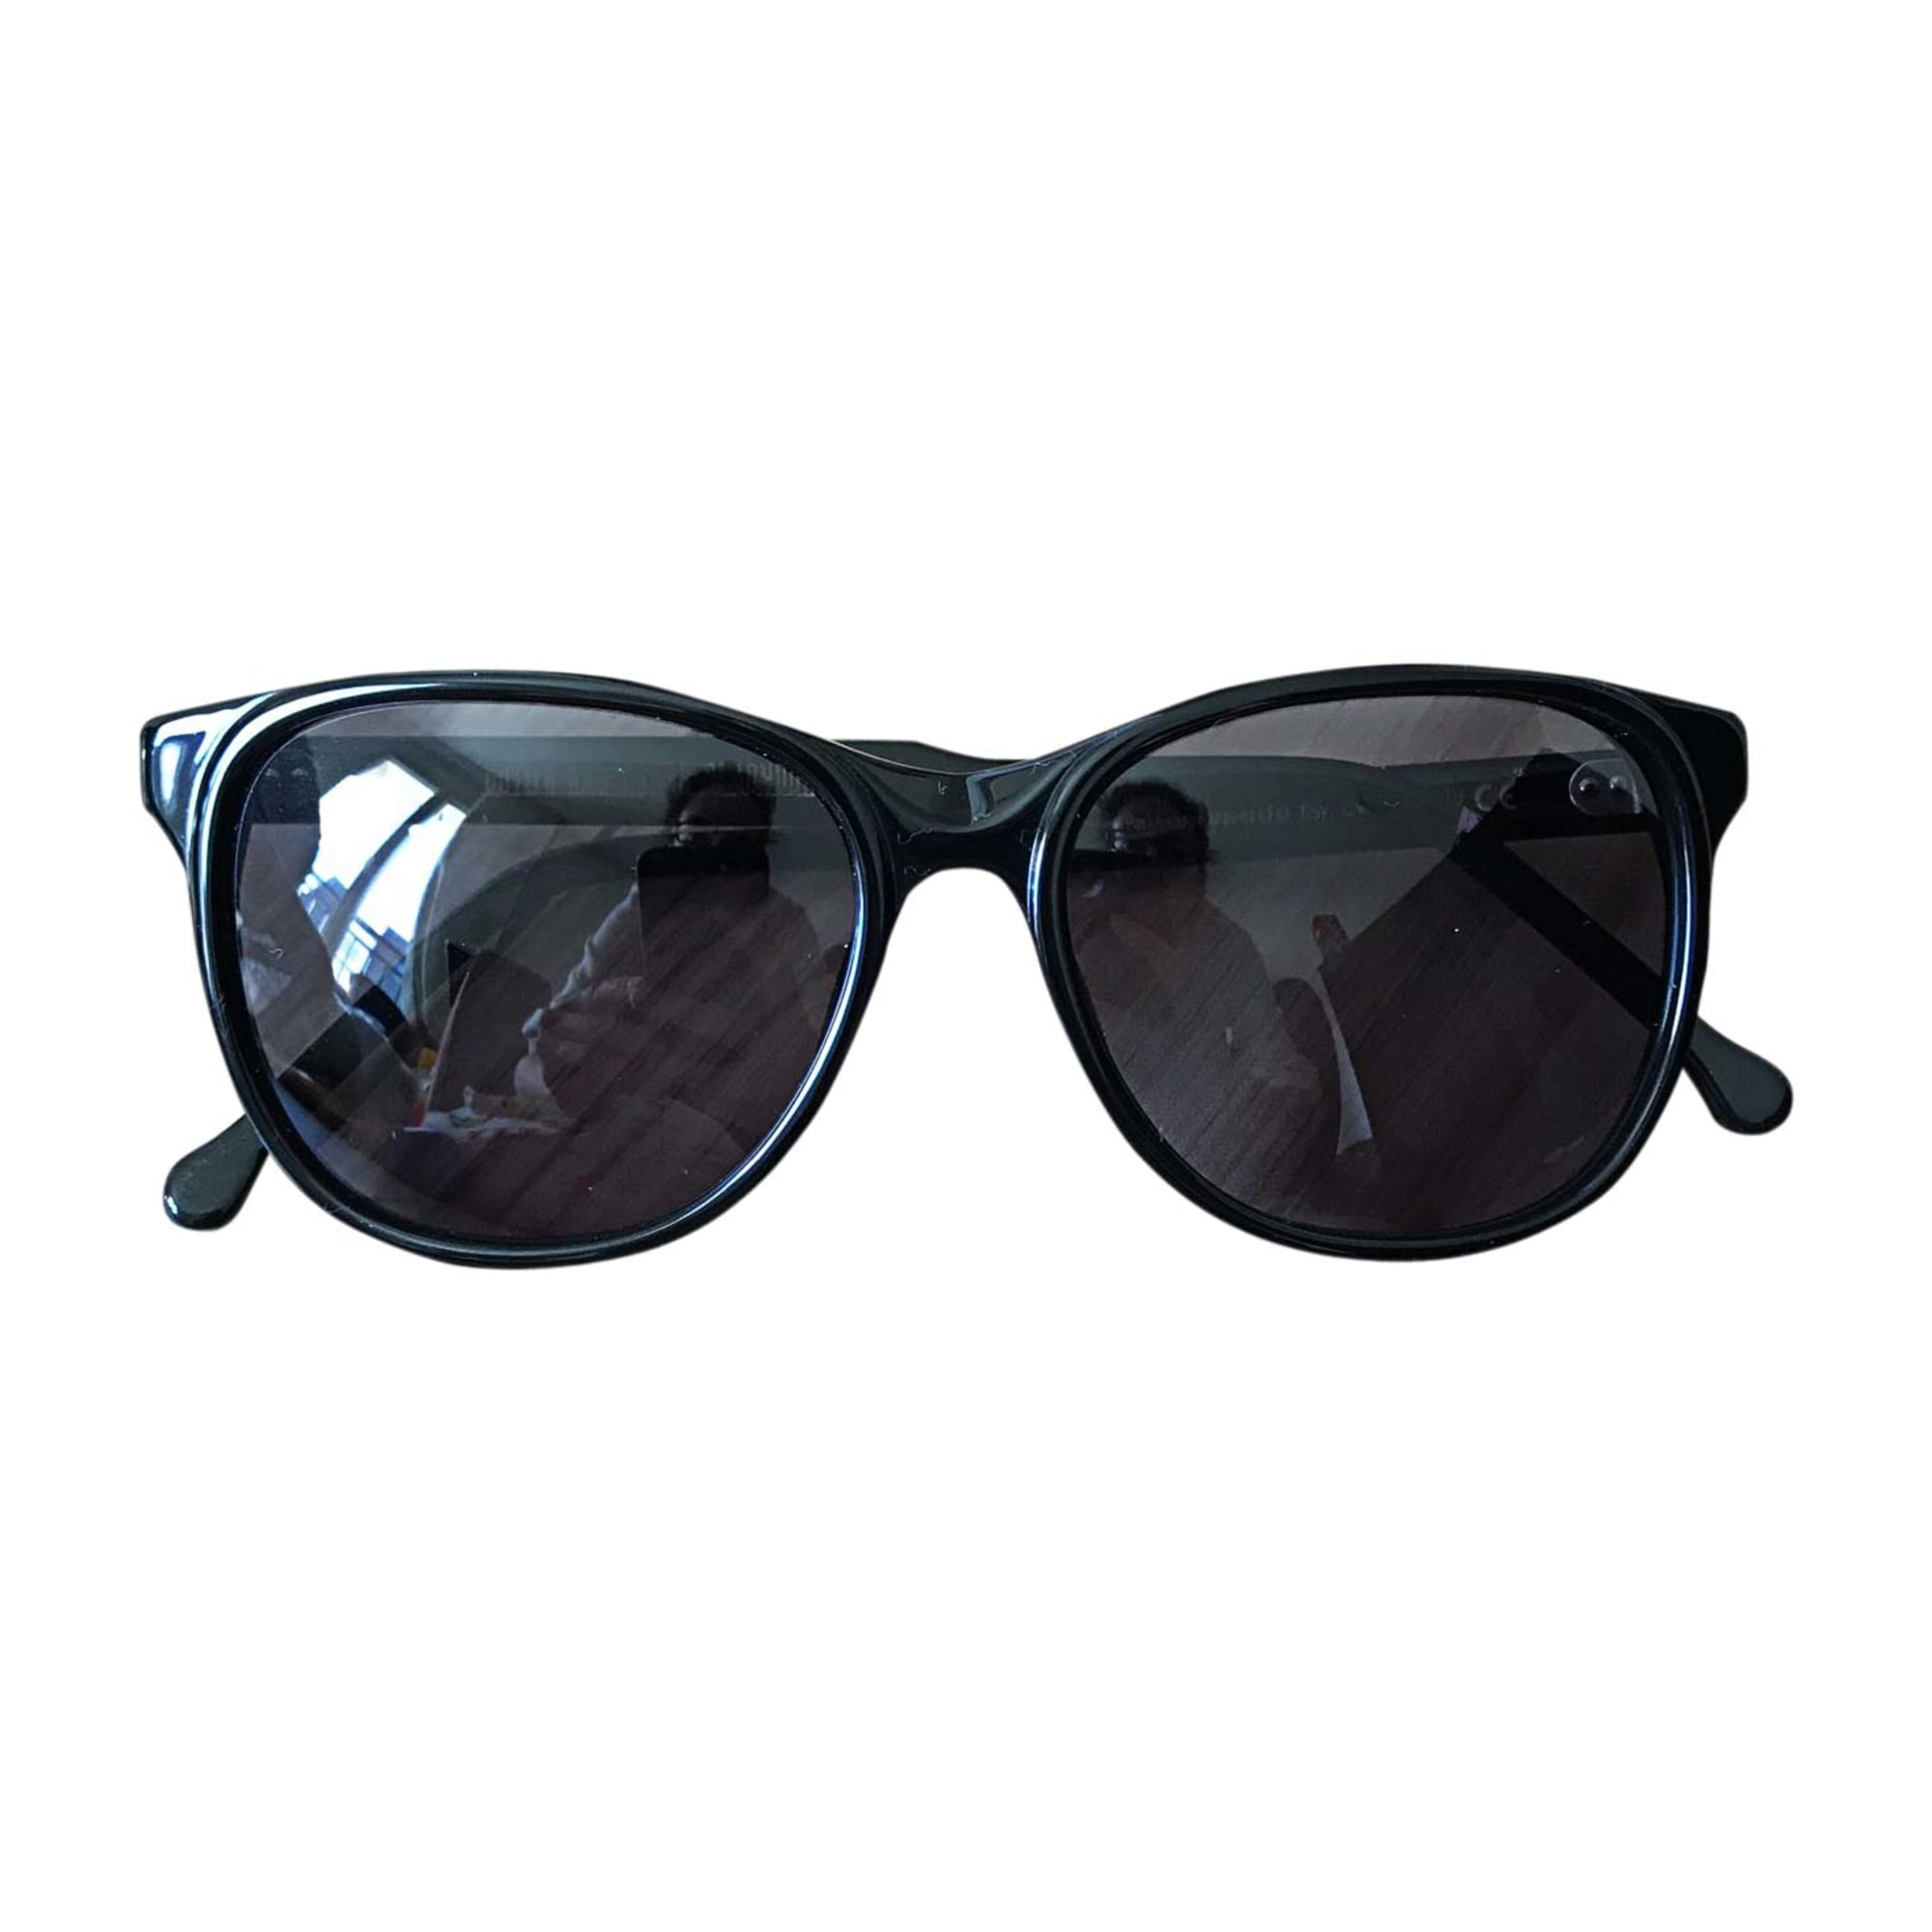 81c57ec59029c6 Sonnenbrille CUTLER AND GROSS schwarz - 7710643